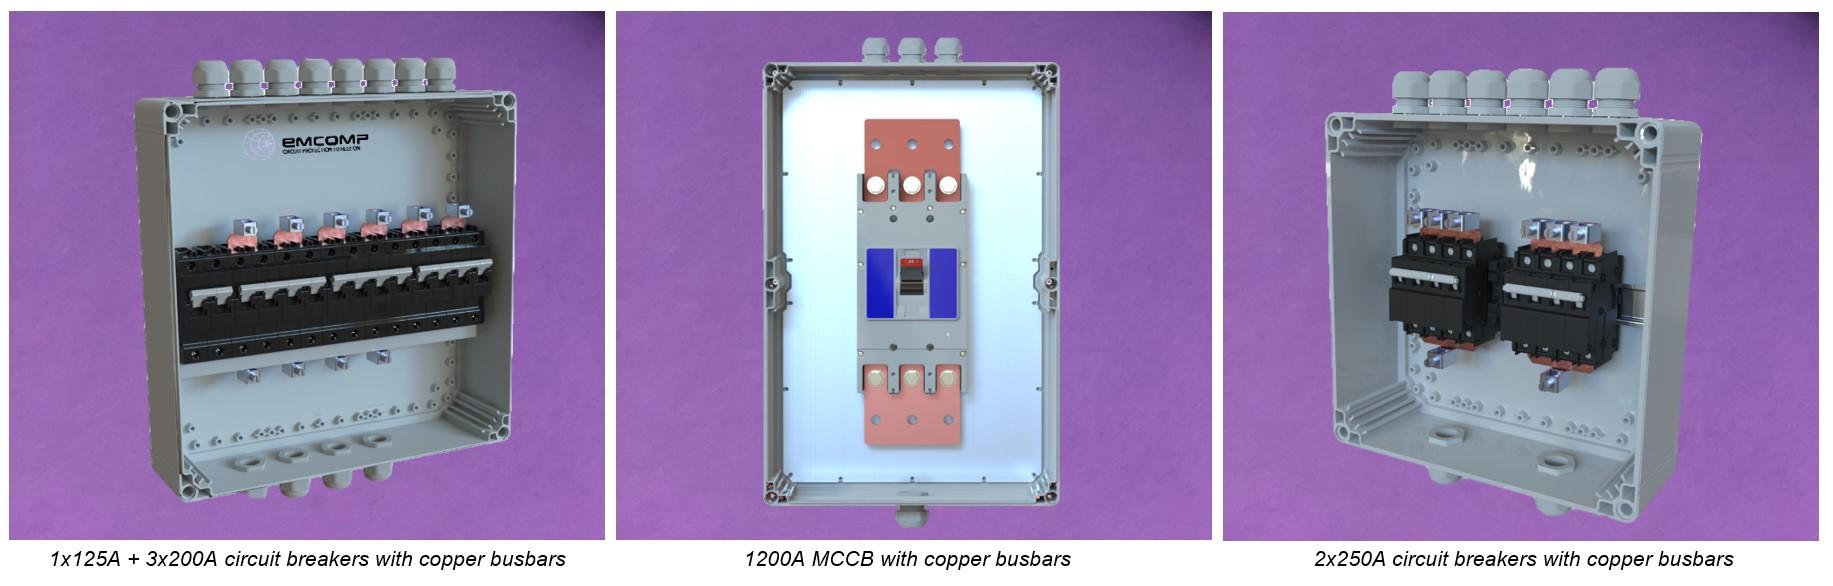 408 collage emcomp battery breaker boxes